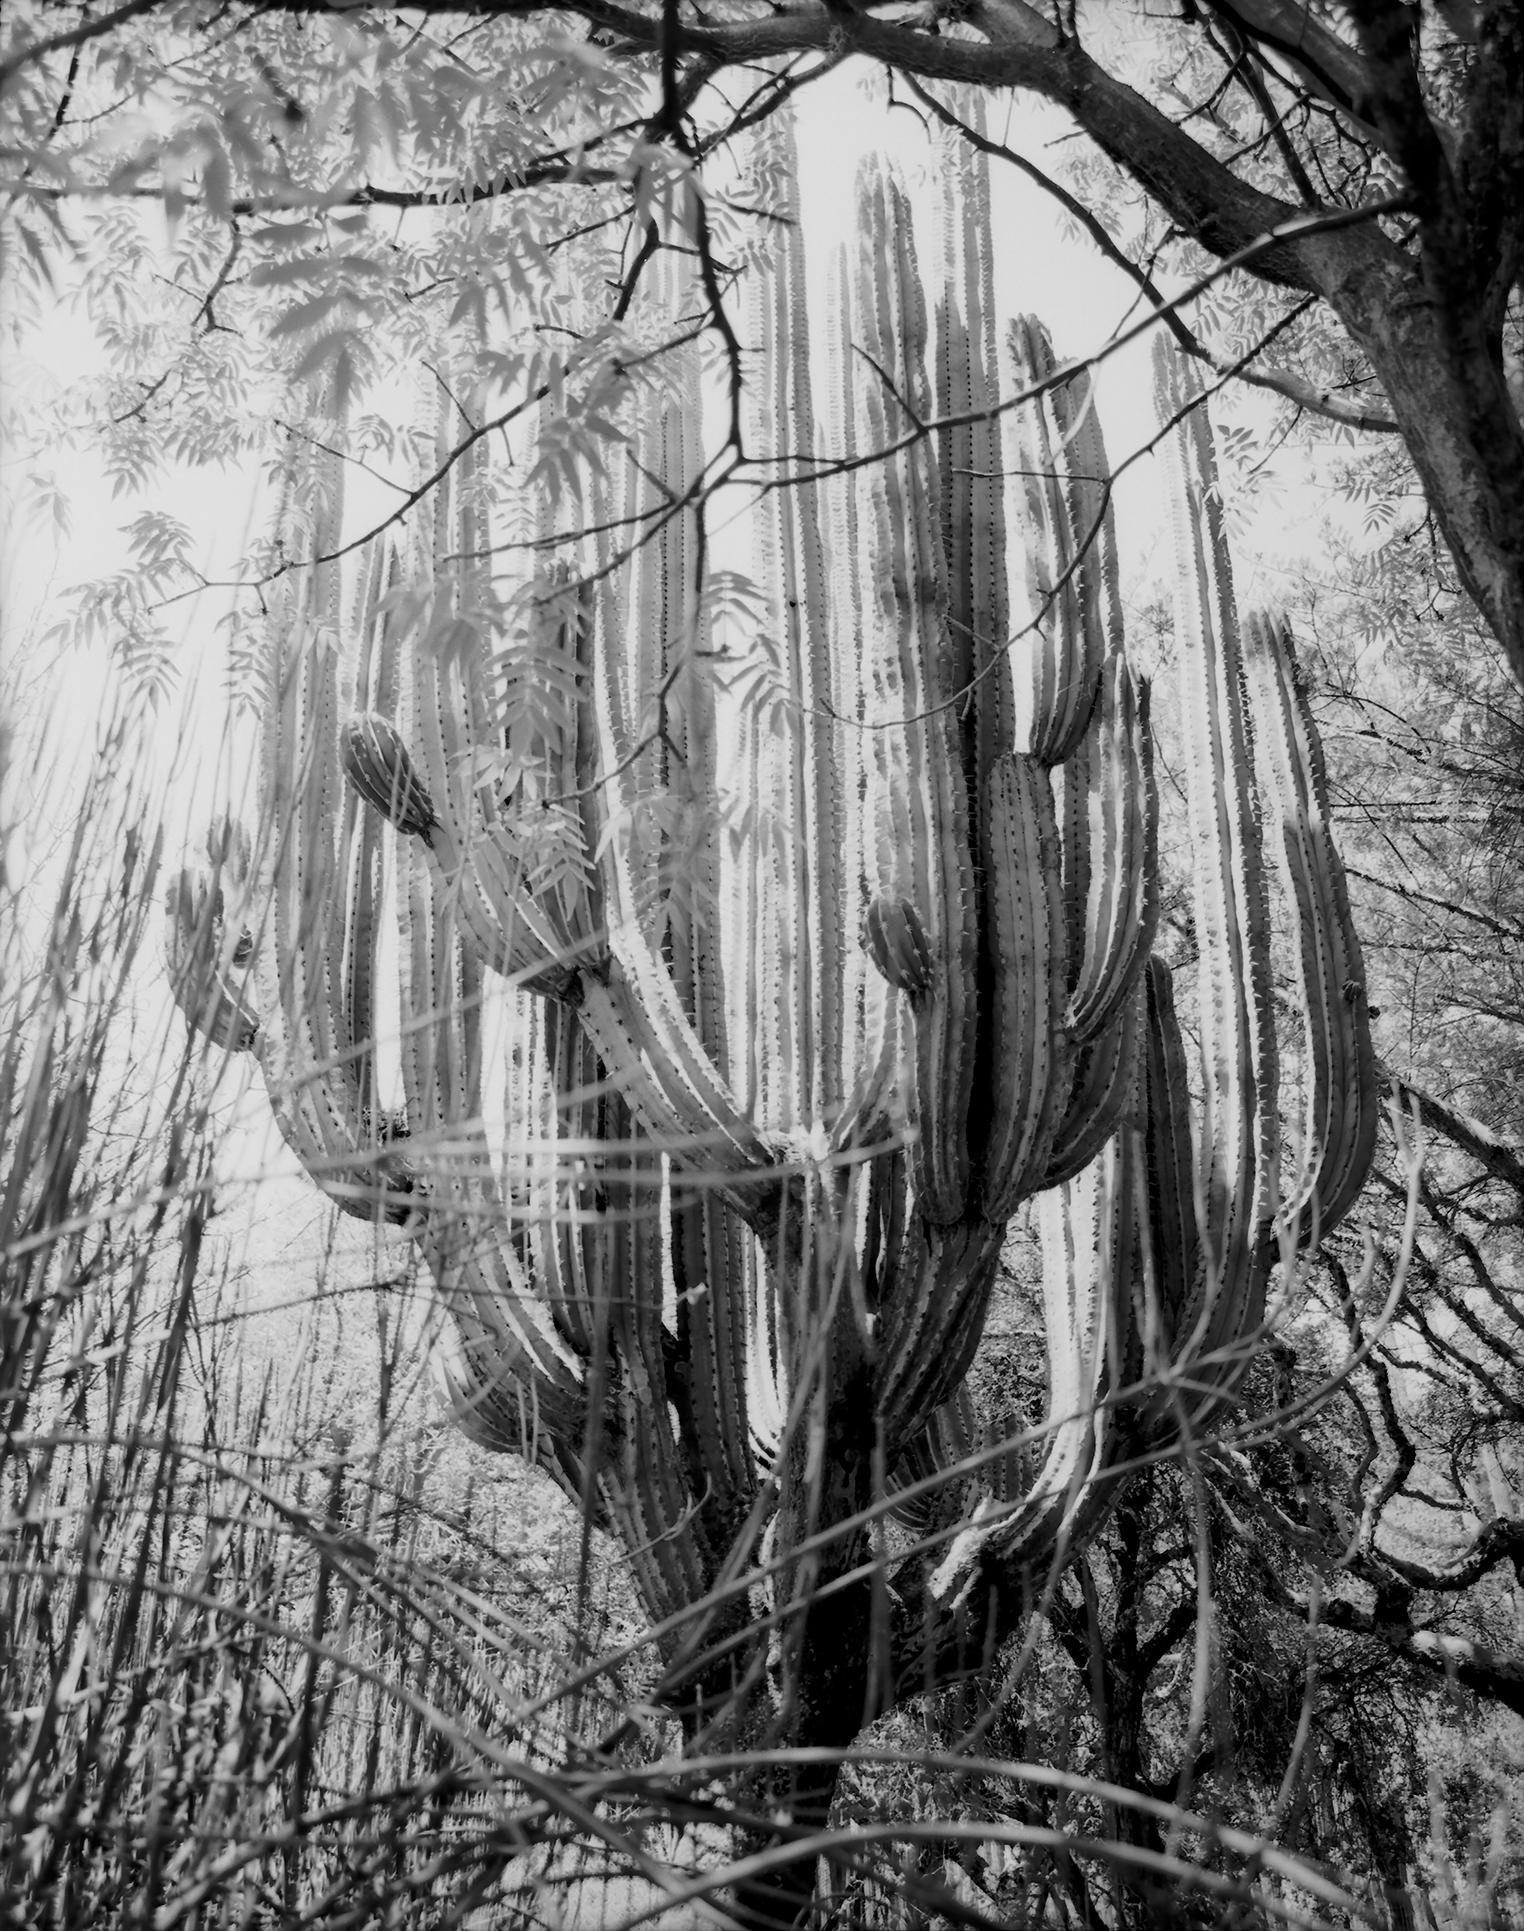 Giant_Cactus_Oaxaca_small.jpg